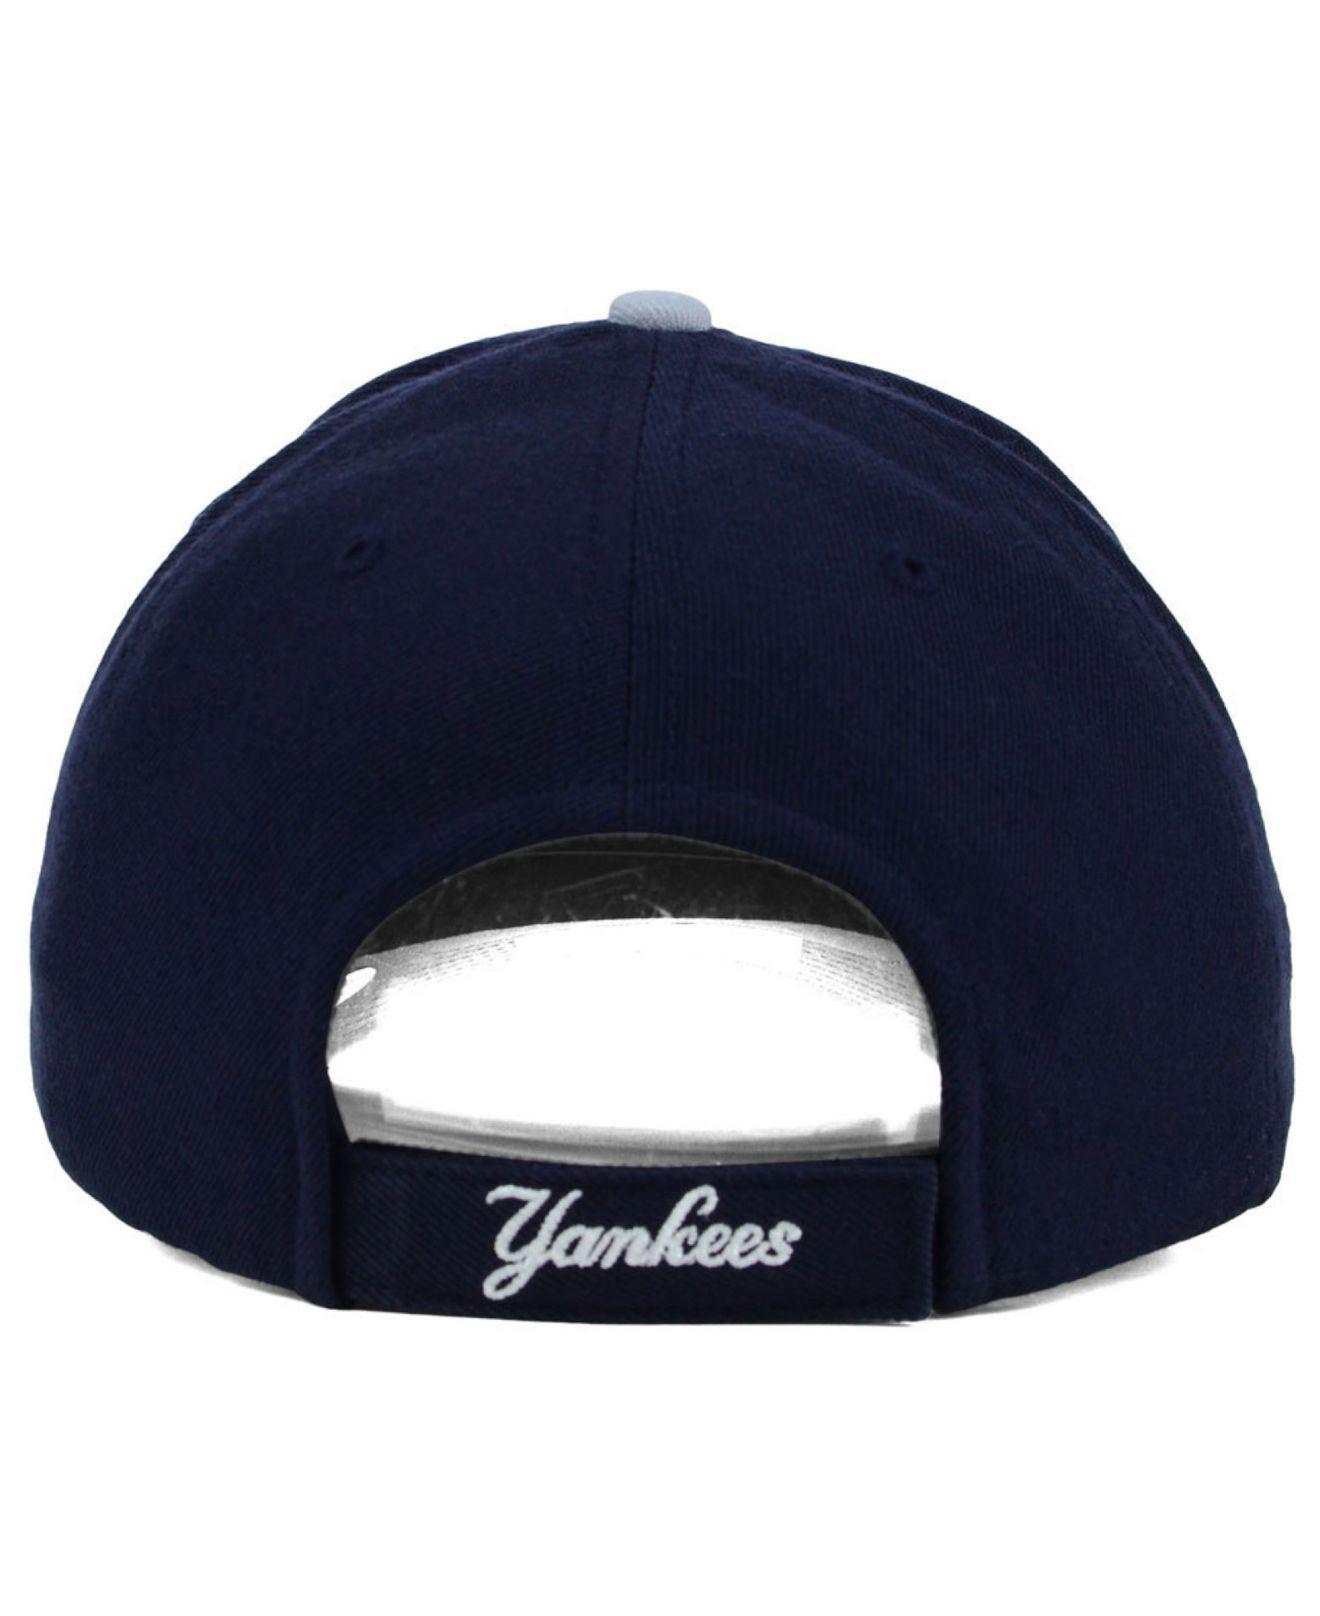 425b0481e13 ... sale new york yankees mvp curved cap for men lyst. view fullscreen  b4472 548d4